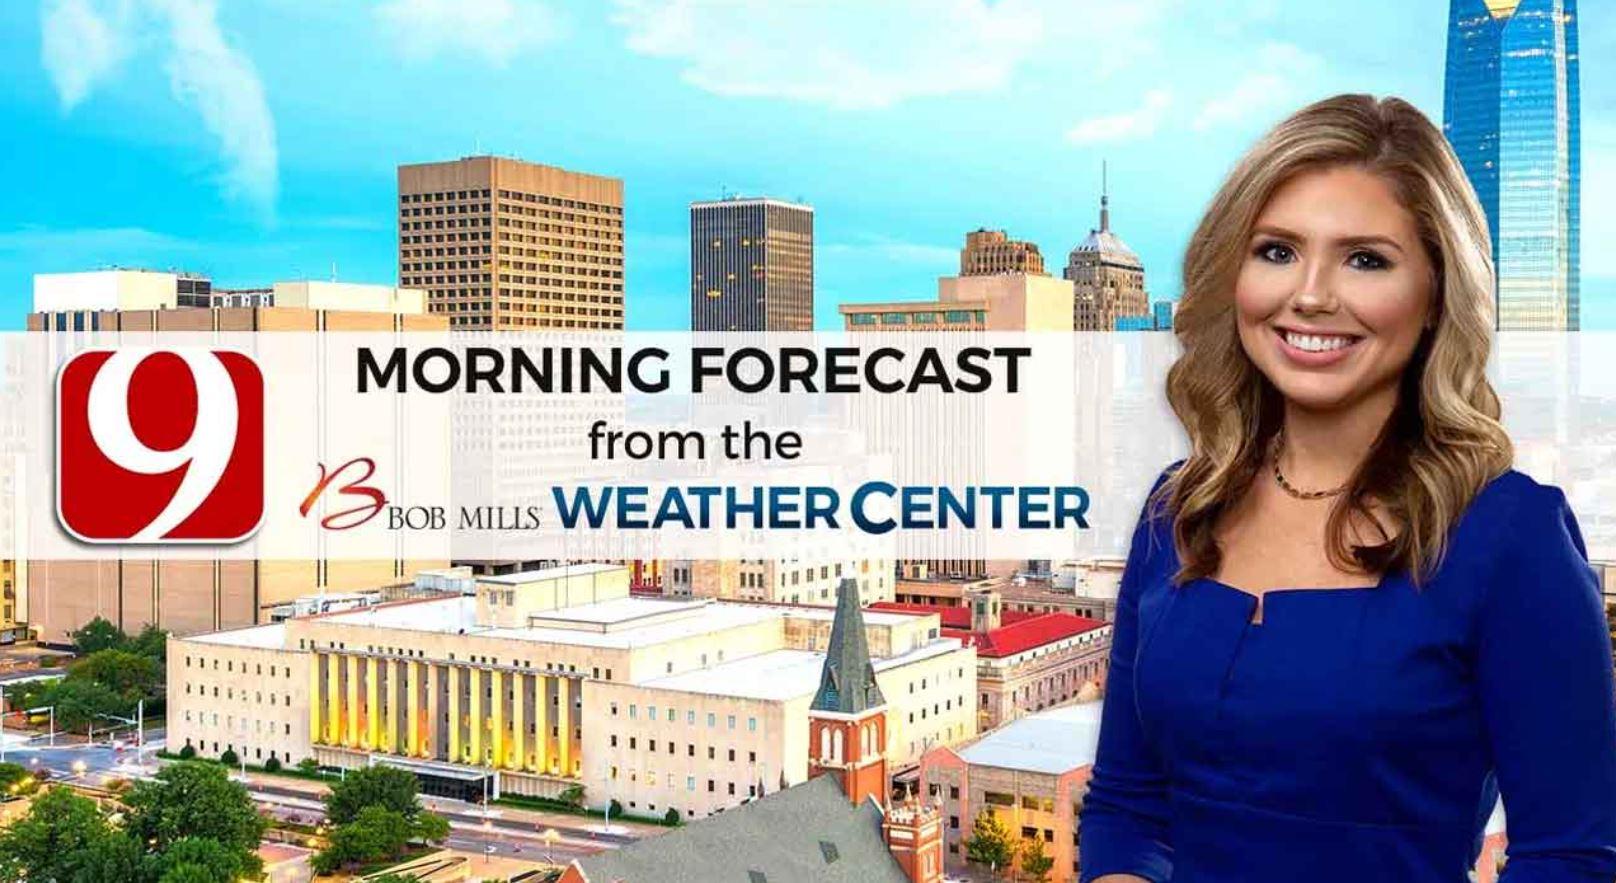 Cassie's Monday 9 A.M. Forecast